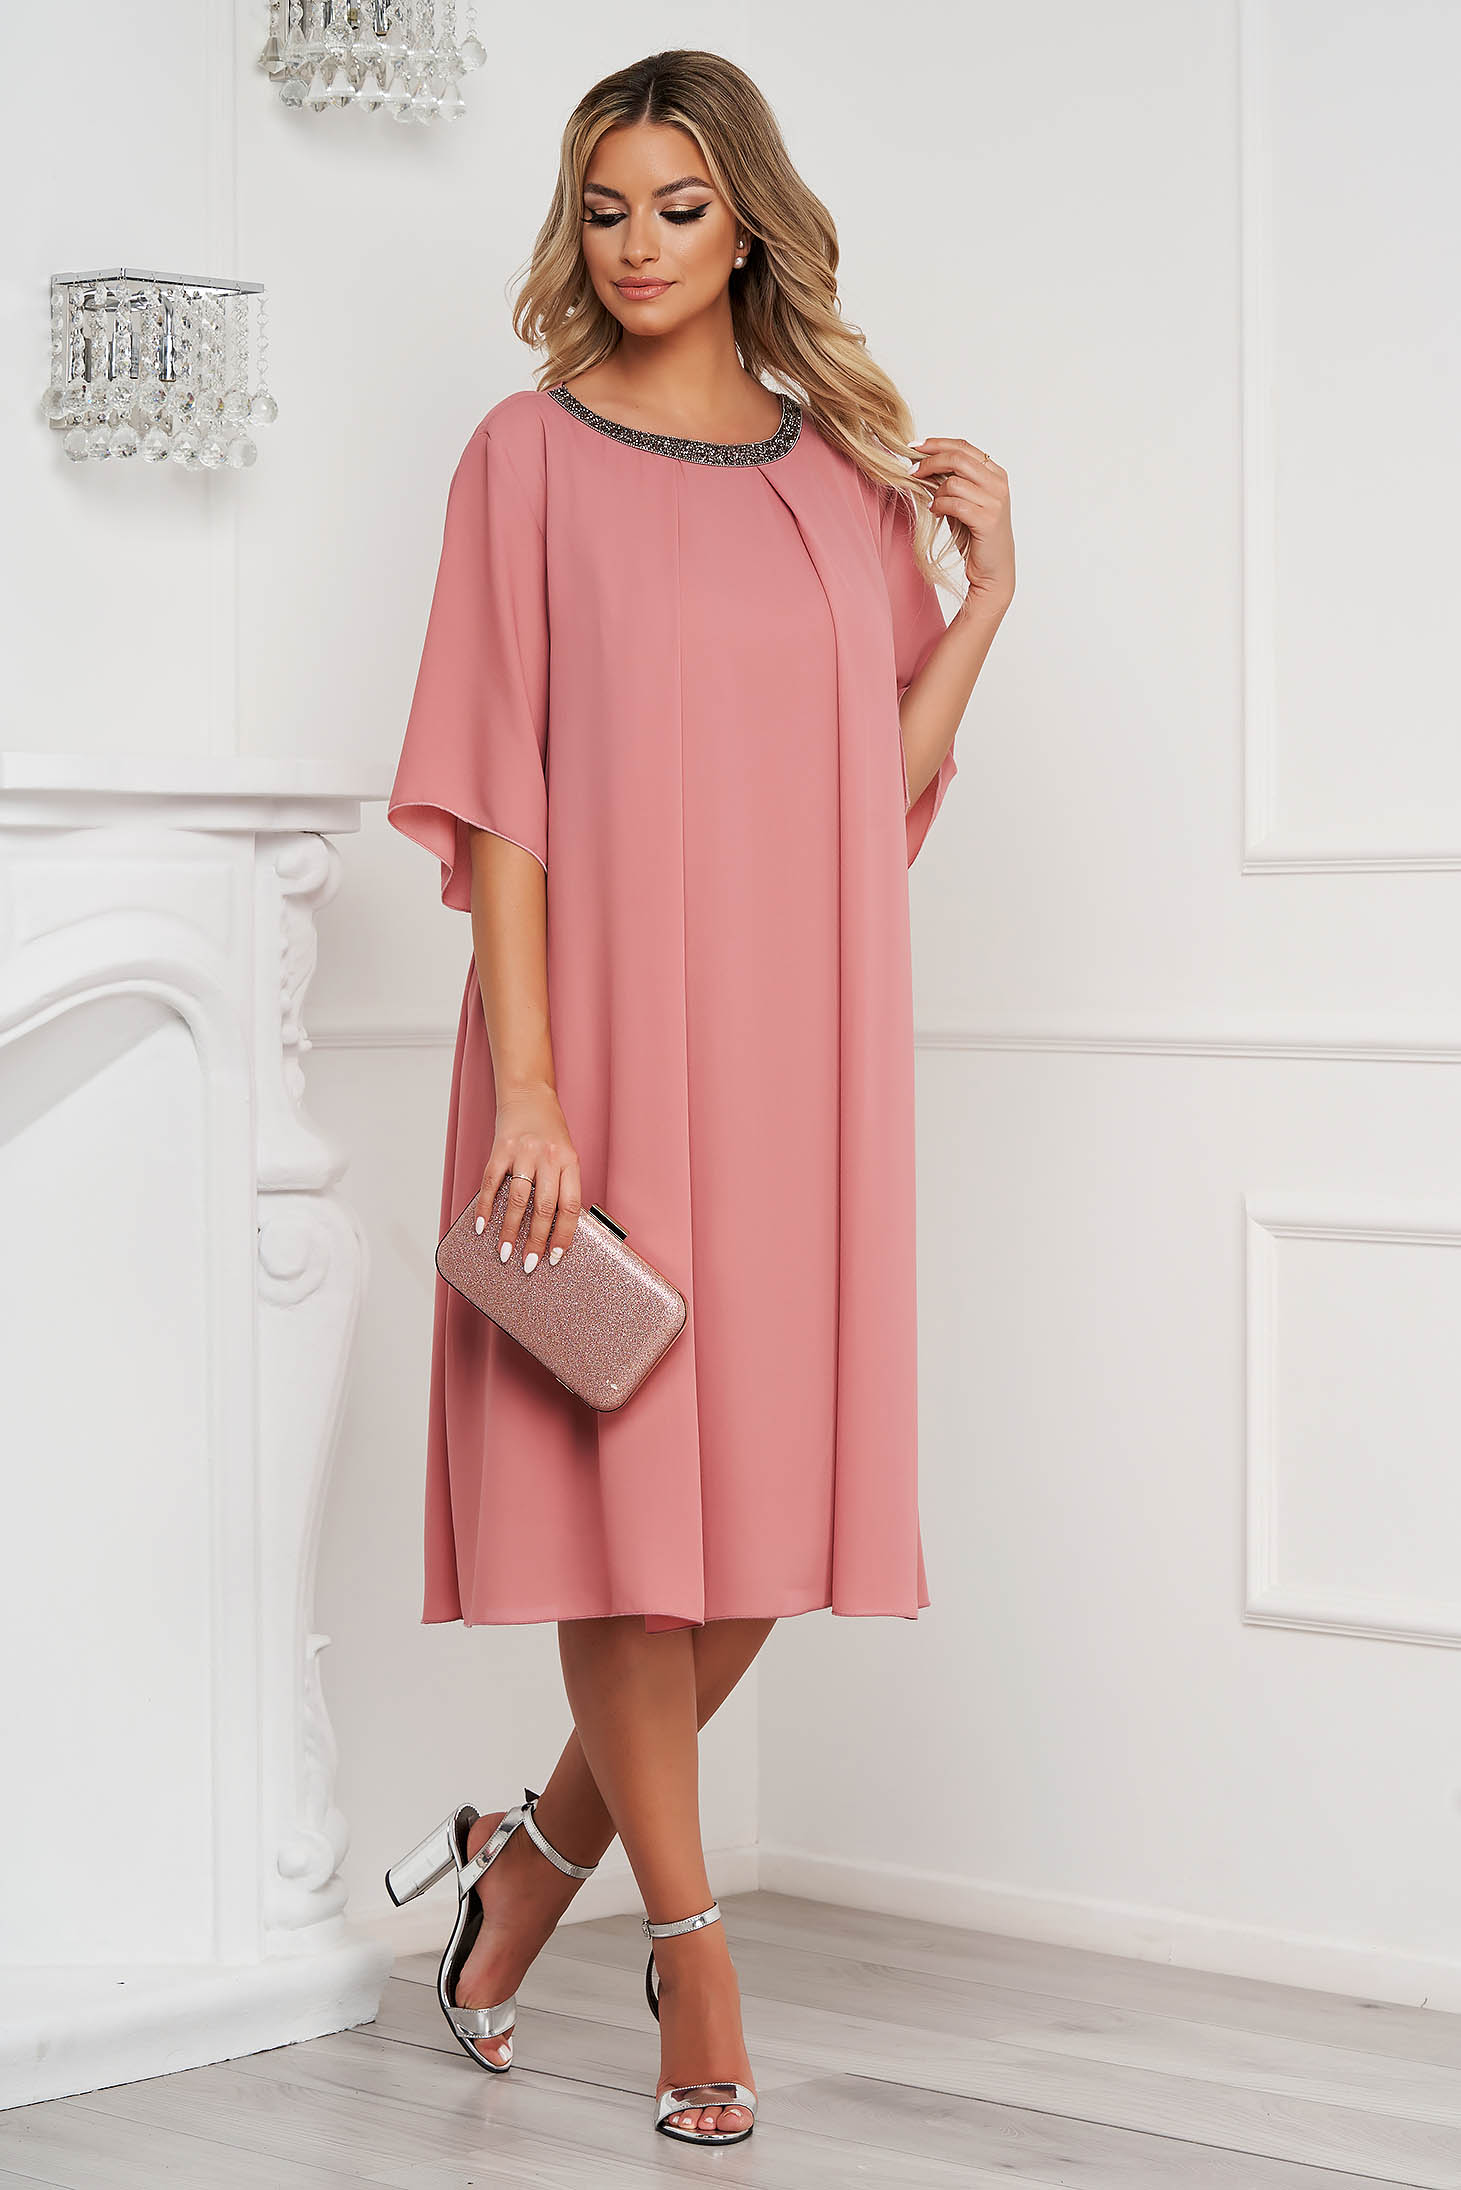 Rochie roz prafuit midi de ocazie cu croi larg din voal cu aplicatii cu pietre strass